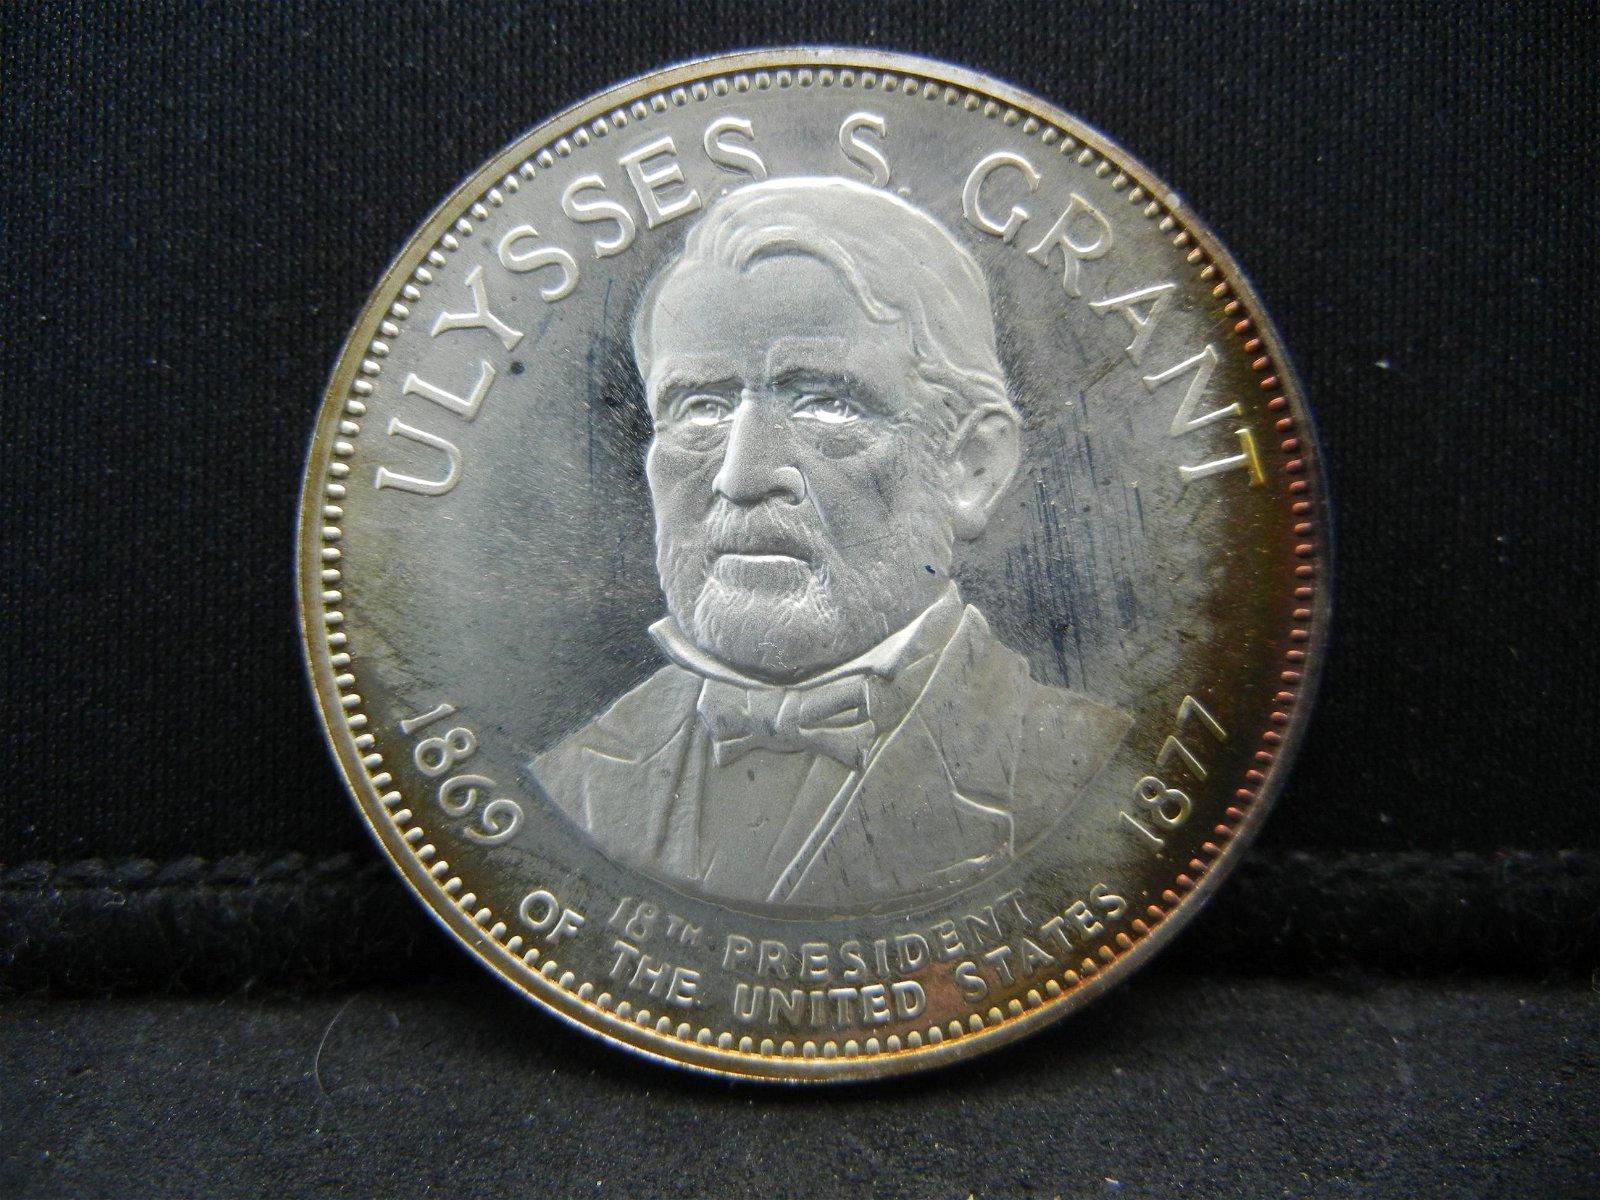 Franklin Mint Ulysses S. Grant .925 Sterling Silver 500